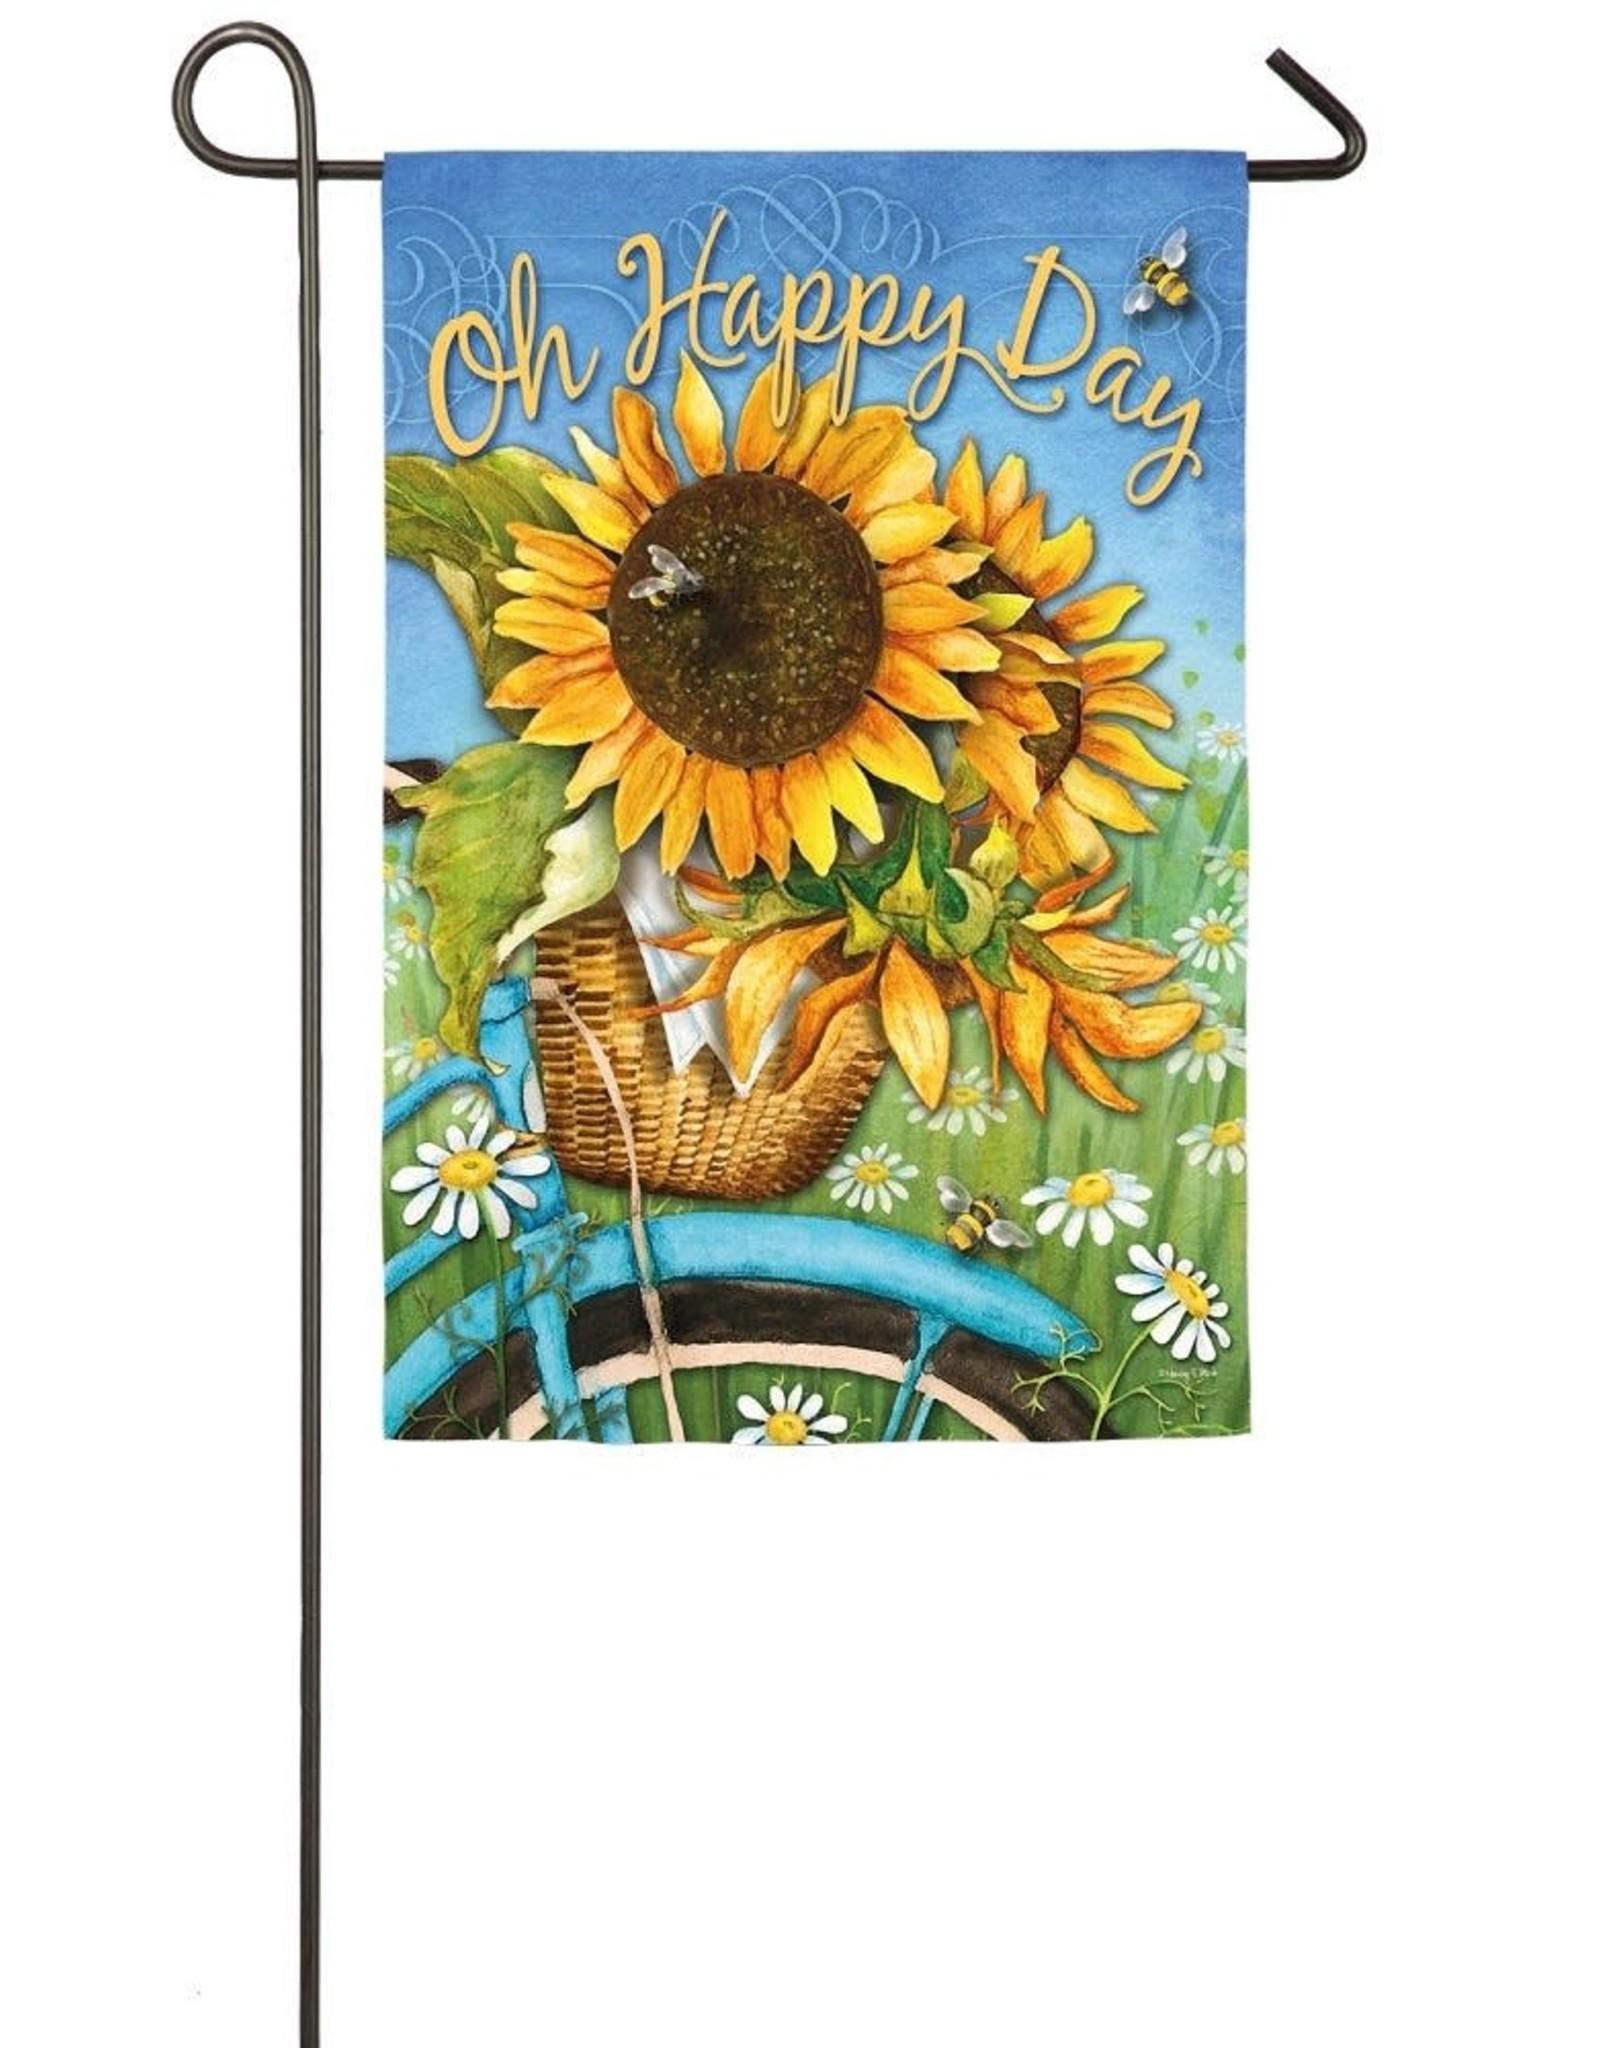 Evergreen EV GF Oh Happy Day Sunflowers